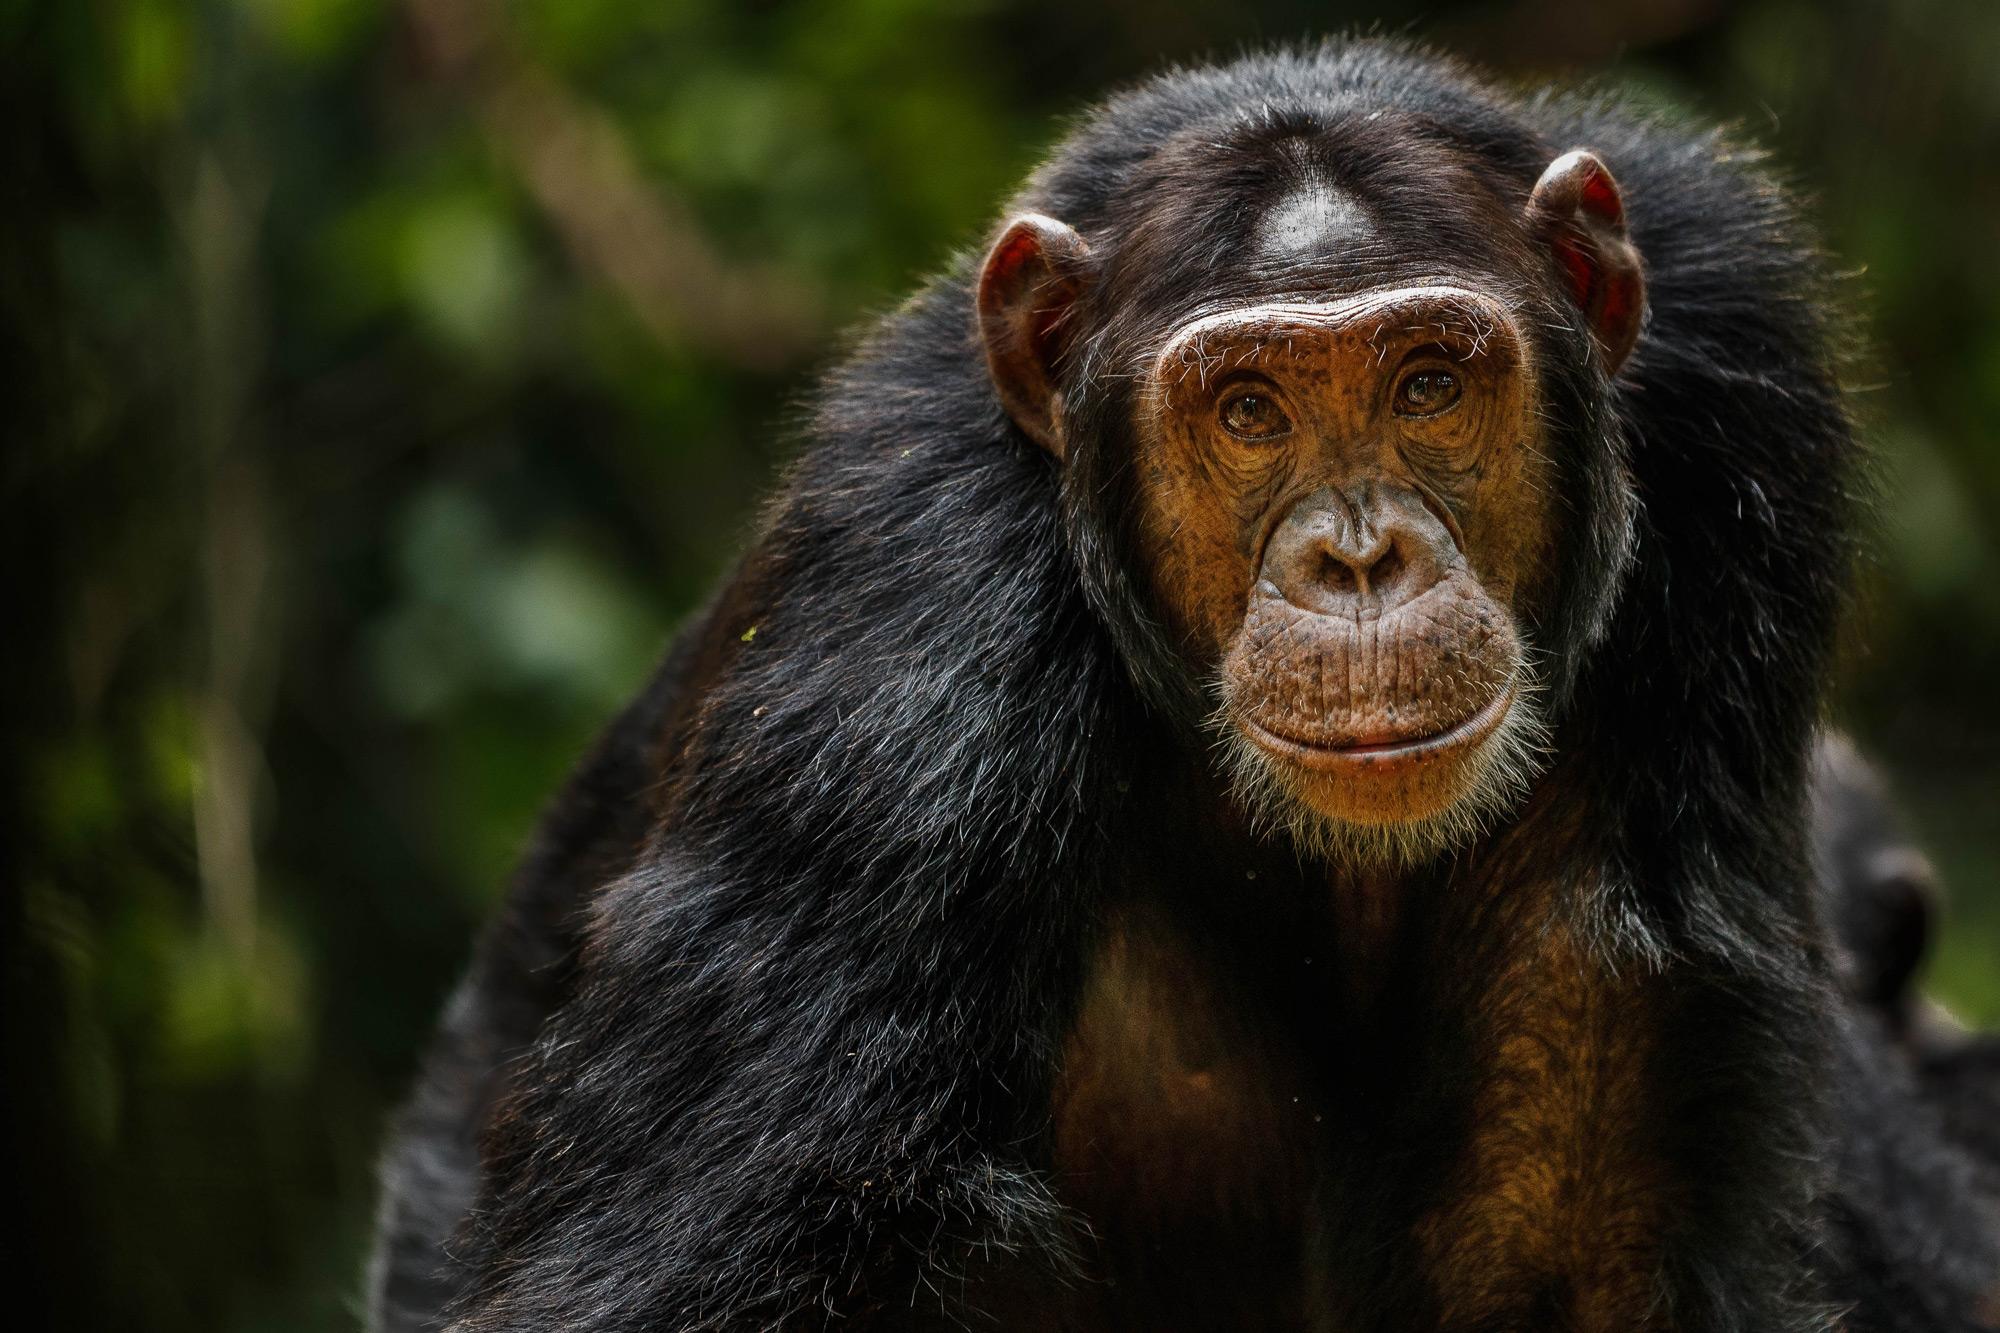 Eye to eye with a chimpanzee in Kibale National Park, Uganda © Thorsten Hanewald